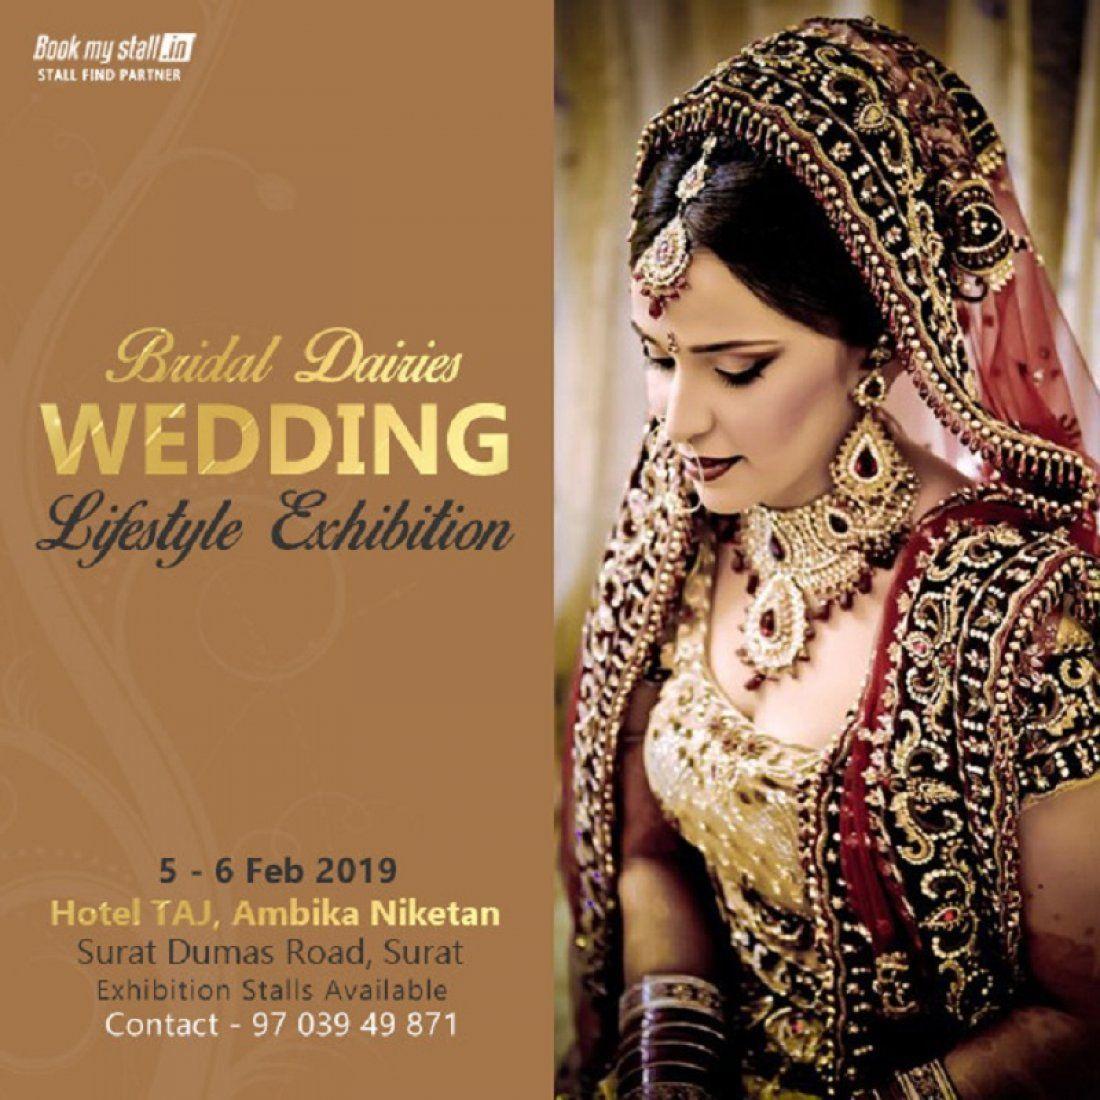 Bridal Dairies - Wedding Lifestyle Exhibition Surat - BookMyStall